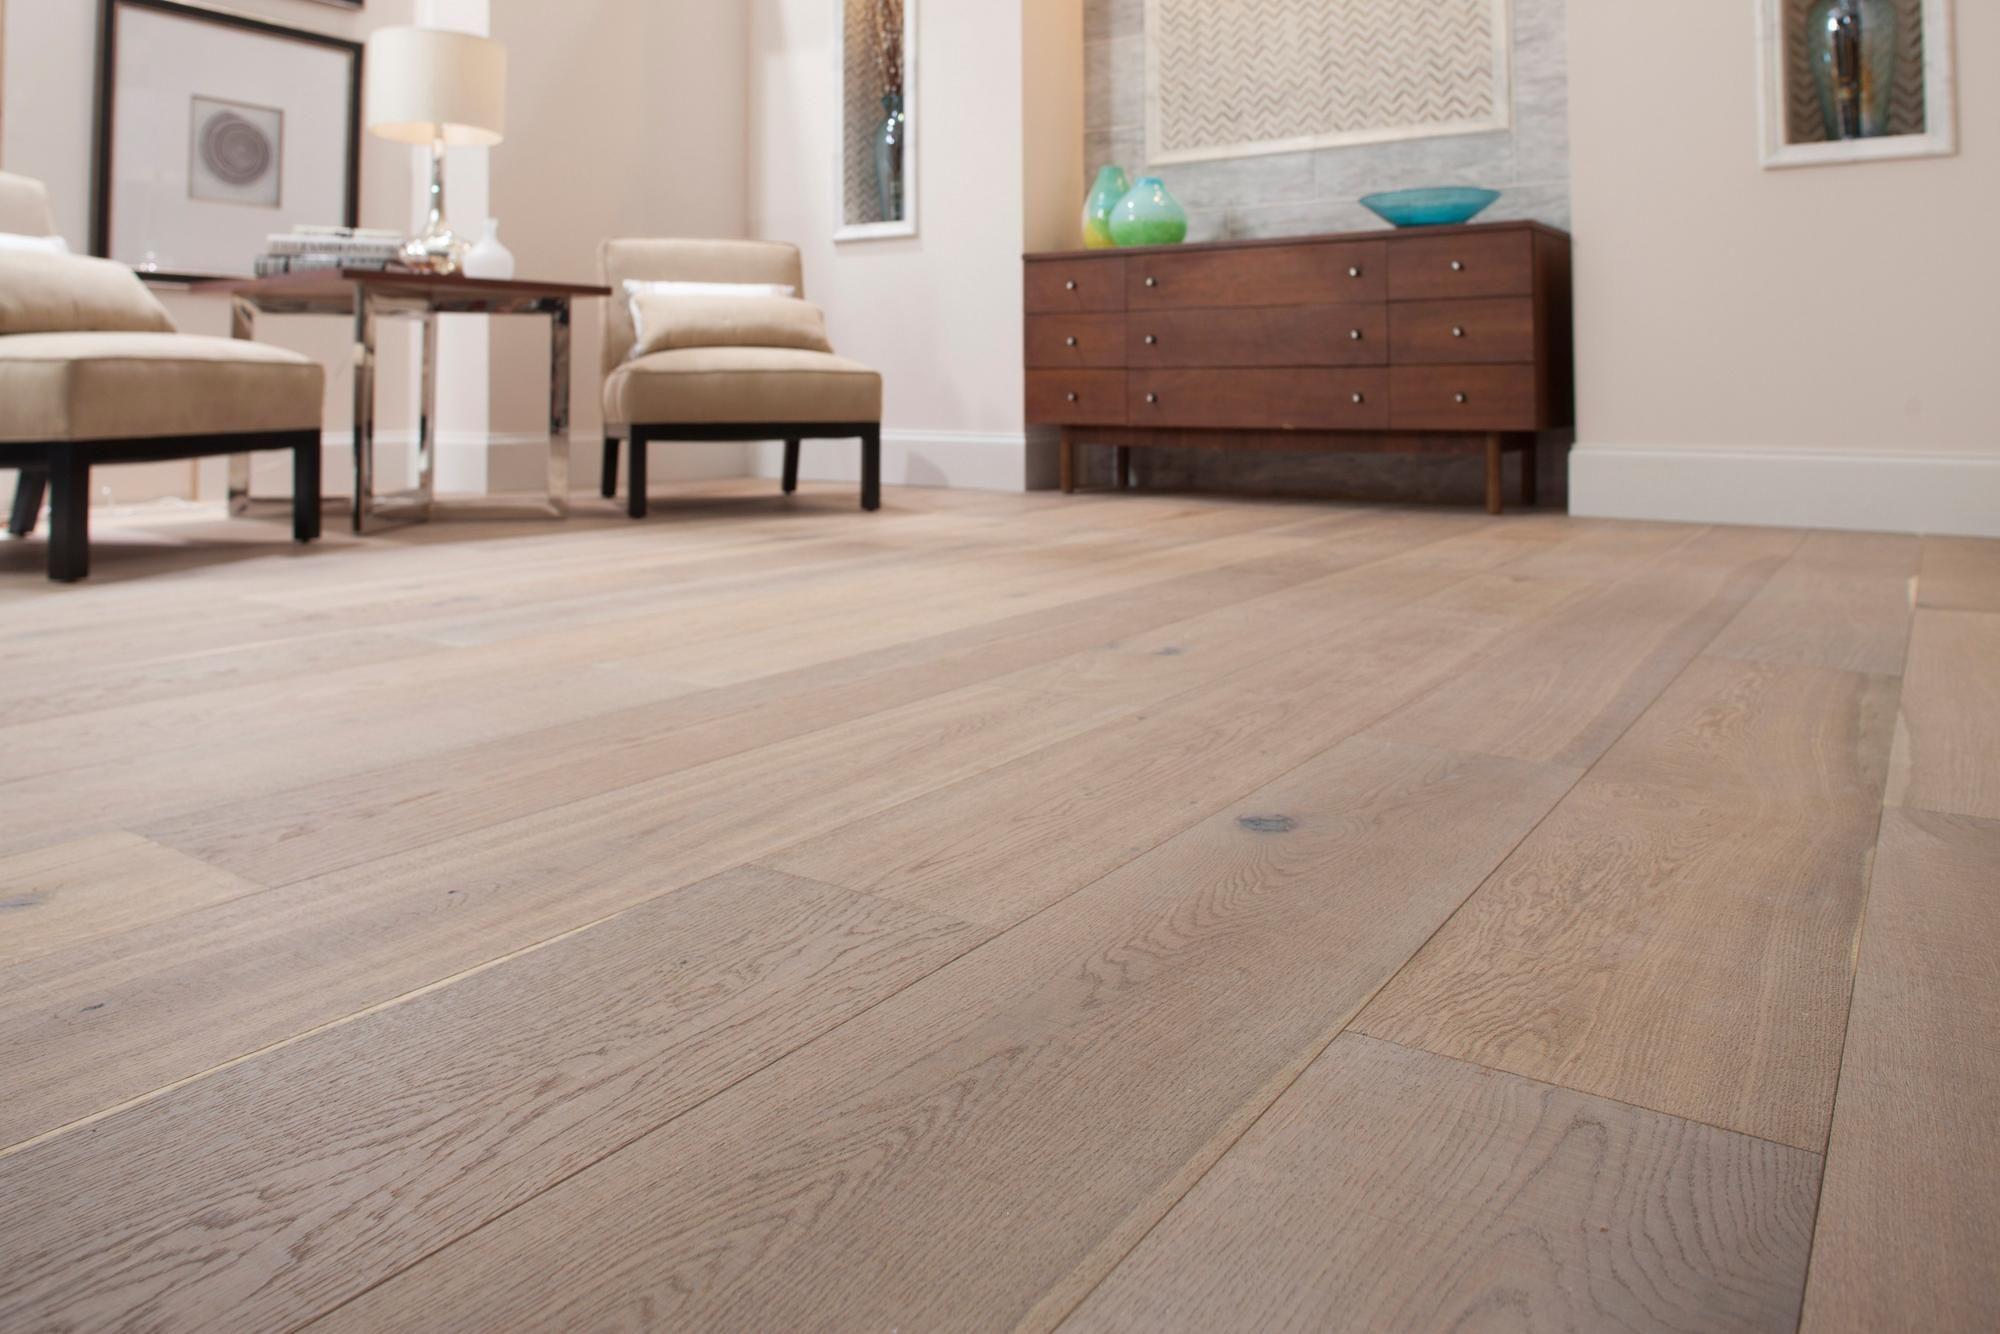 Montpellier Oak Engineered Hardwood Floor Decor Oak Engineered Hardwood Engineered Hardwood Engineered Hardwood Flooring